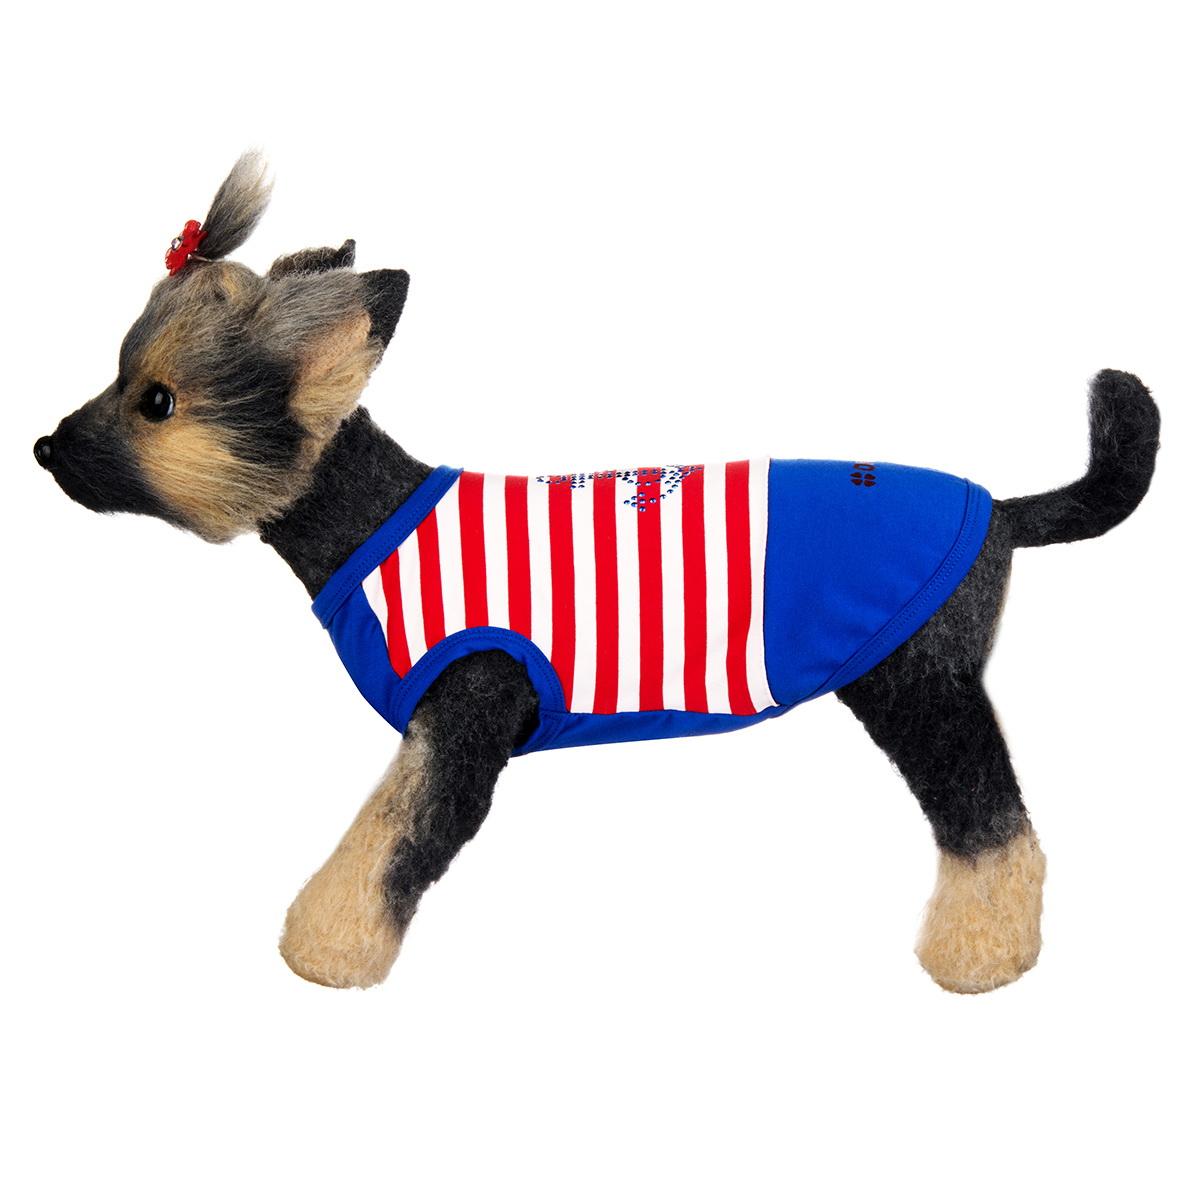 "Майка для собак Dogmoda ""Круиз"", унисекс. Размер 1 (S)"